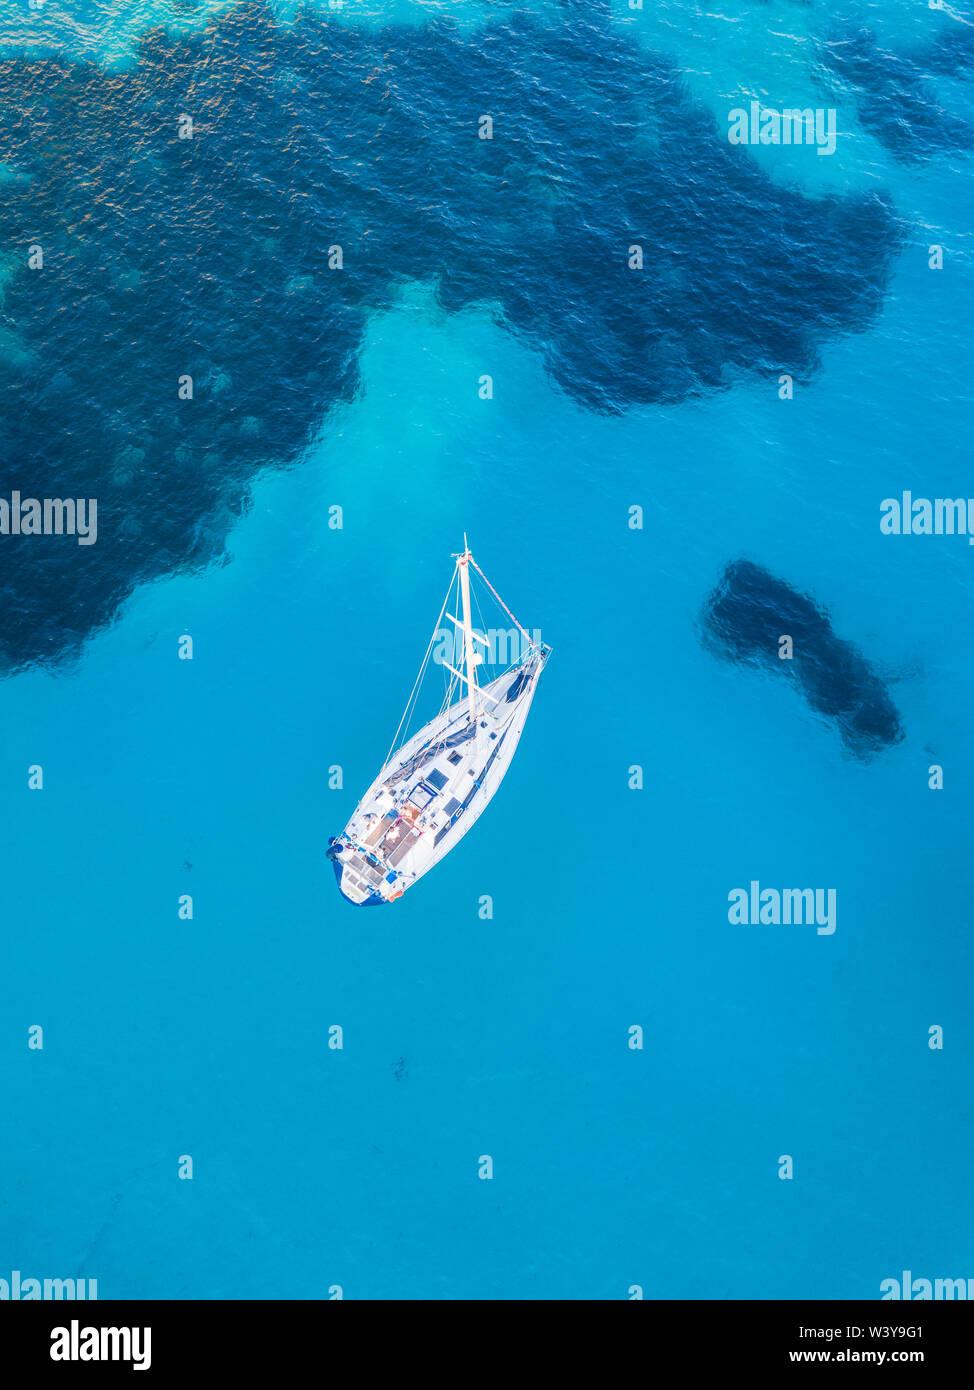 Aerial view of yacht, Menorca, Balearic Islands, Spain - Stock Image